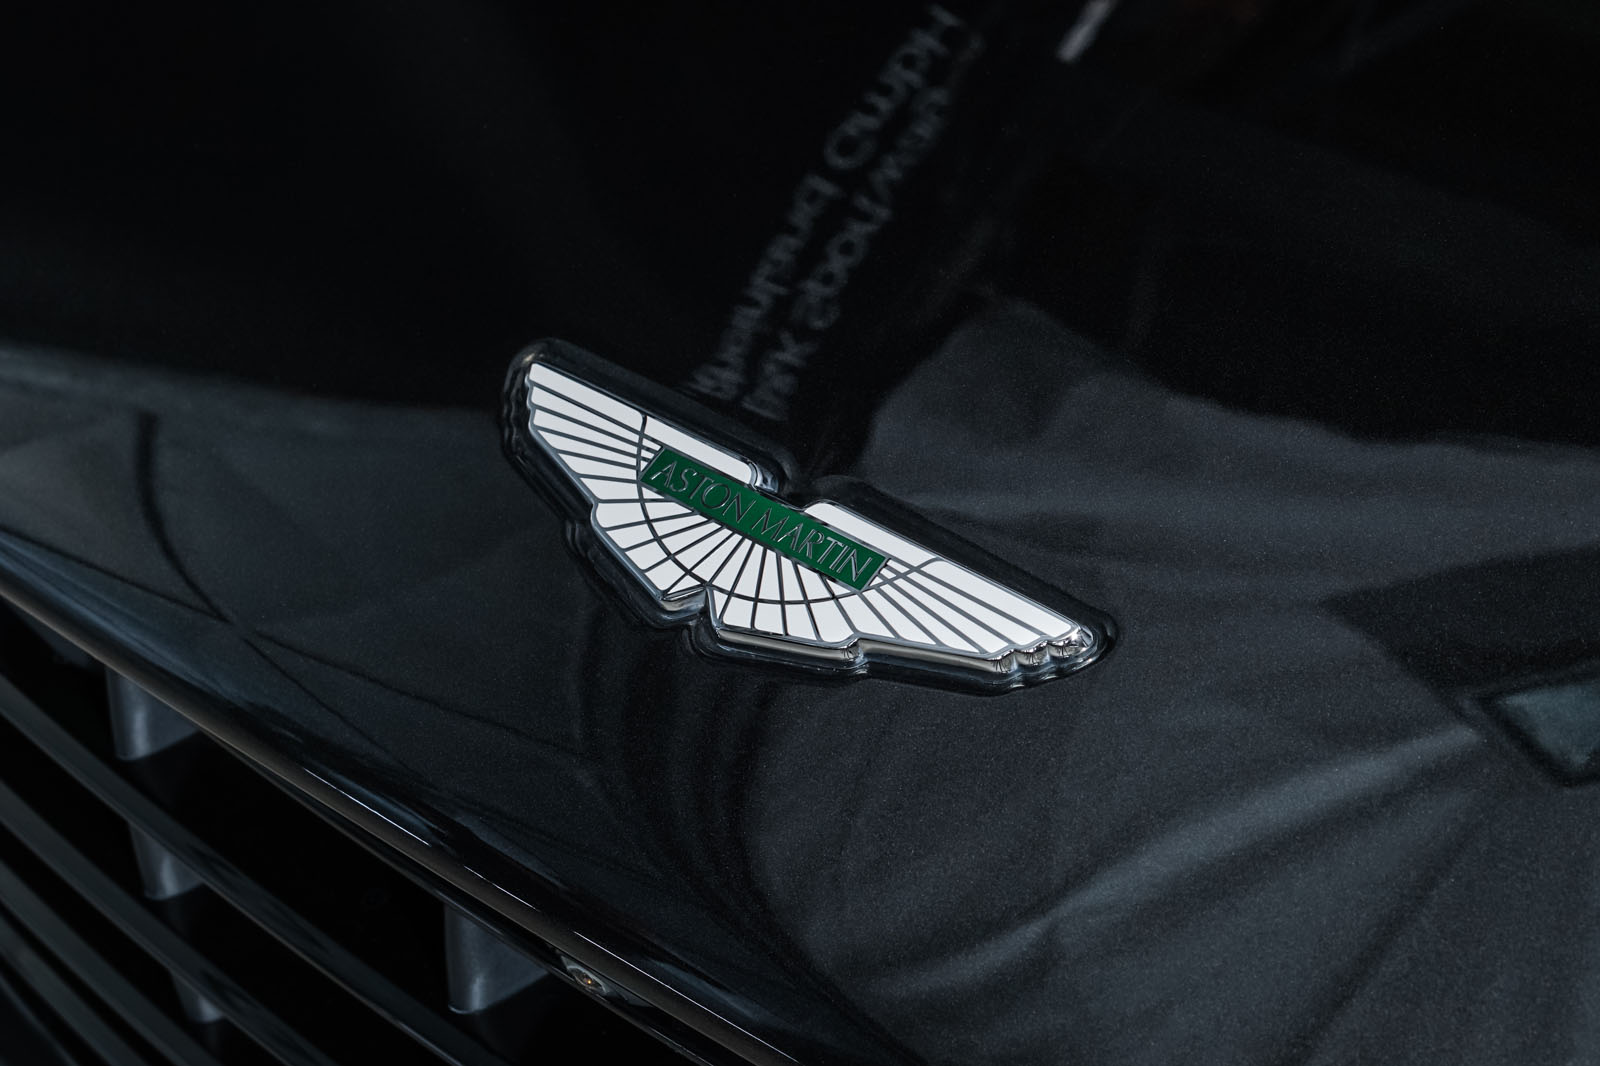 Aston-Martin_DB11_CeramicBlack_Schwarz_AM-1916_14_w